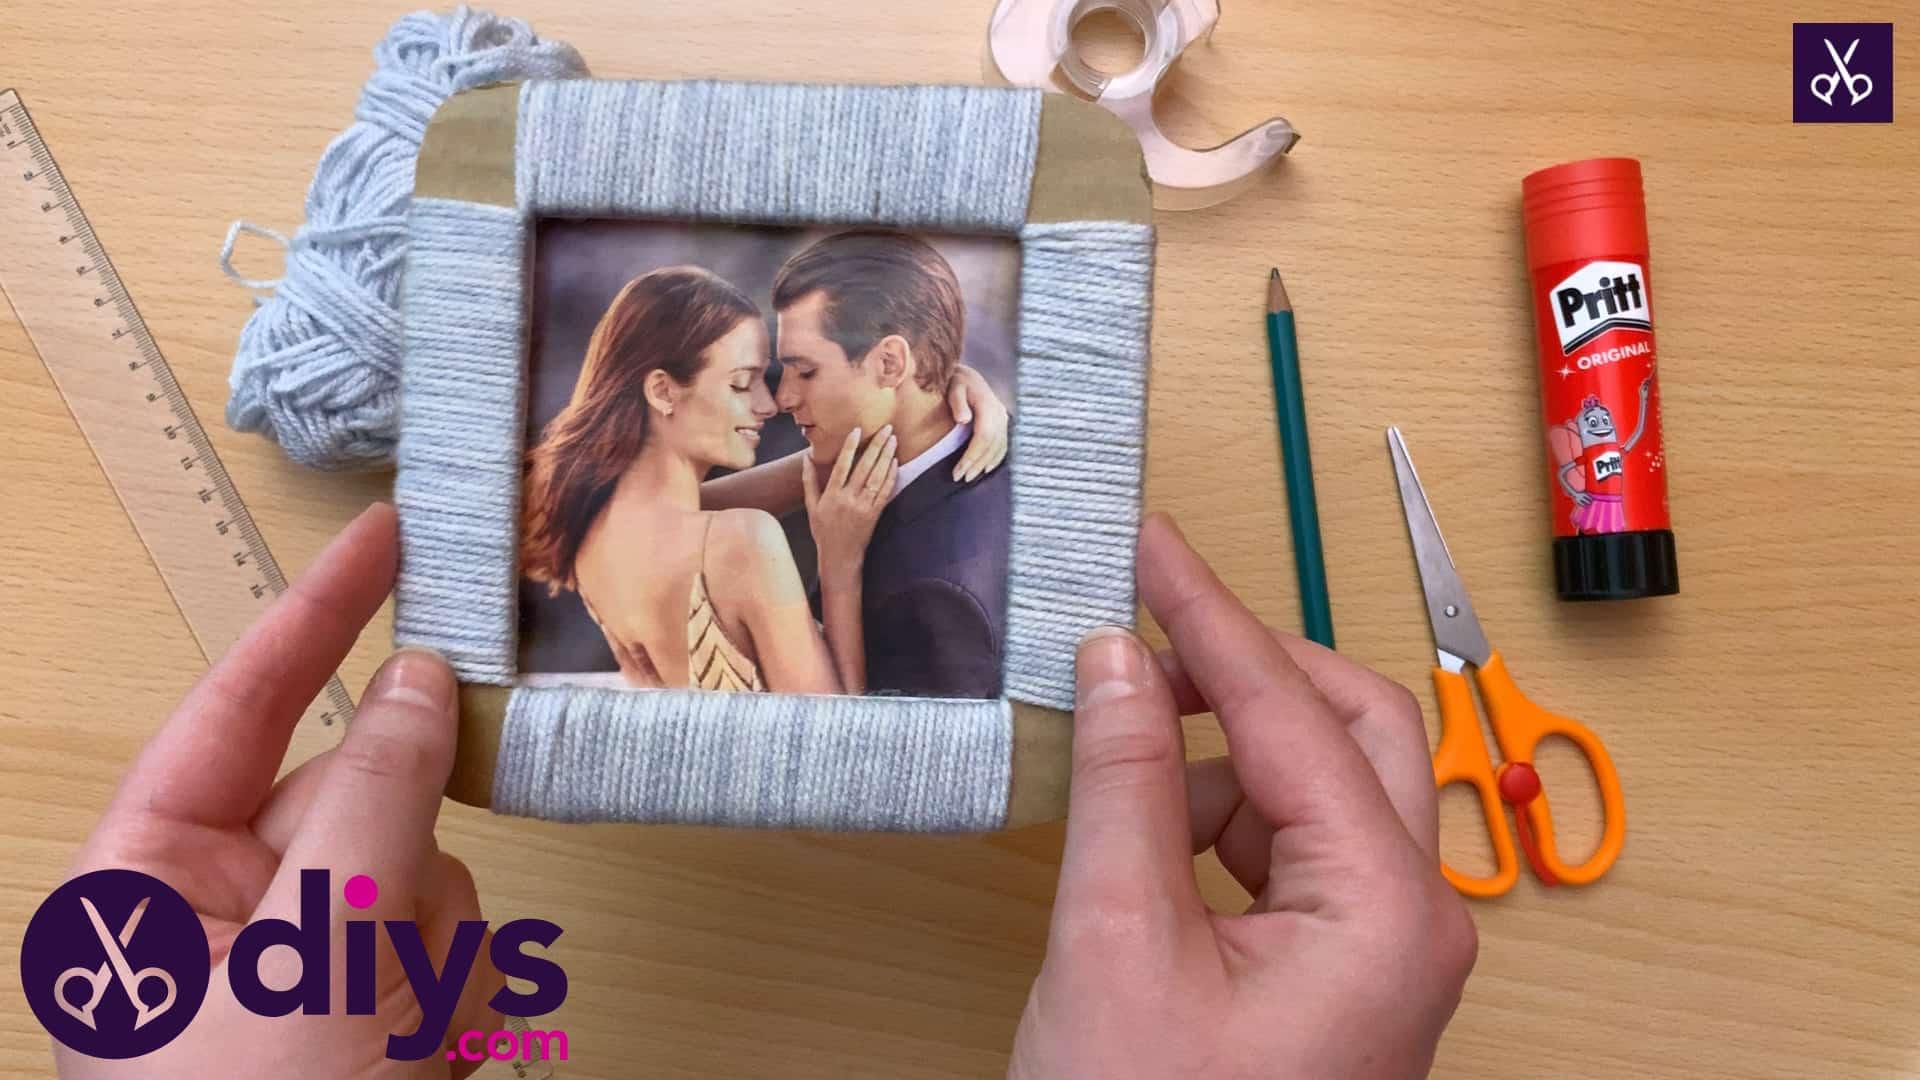 How to make a cardboard photo frame creating a beautiful frame